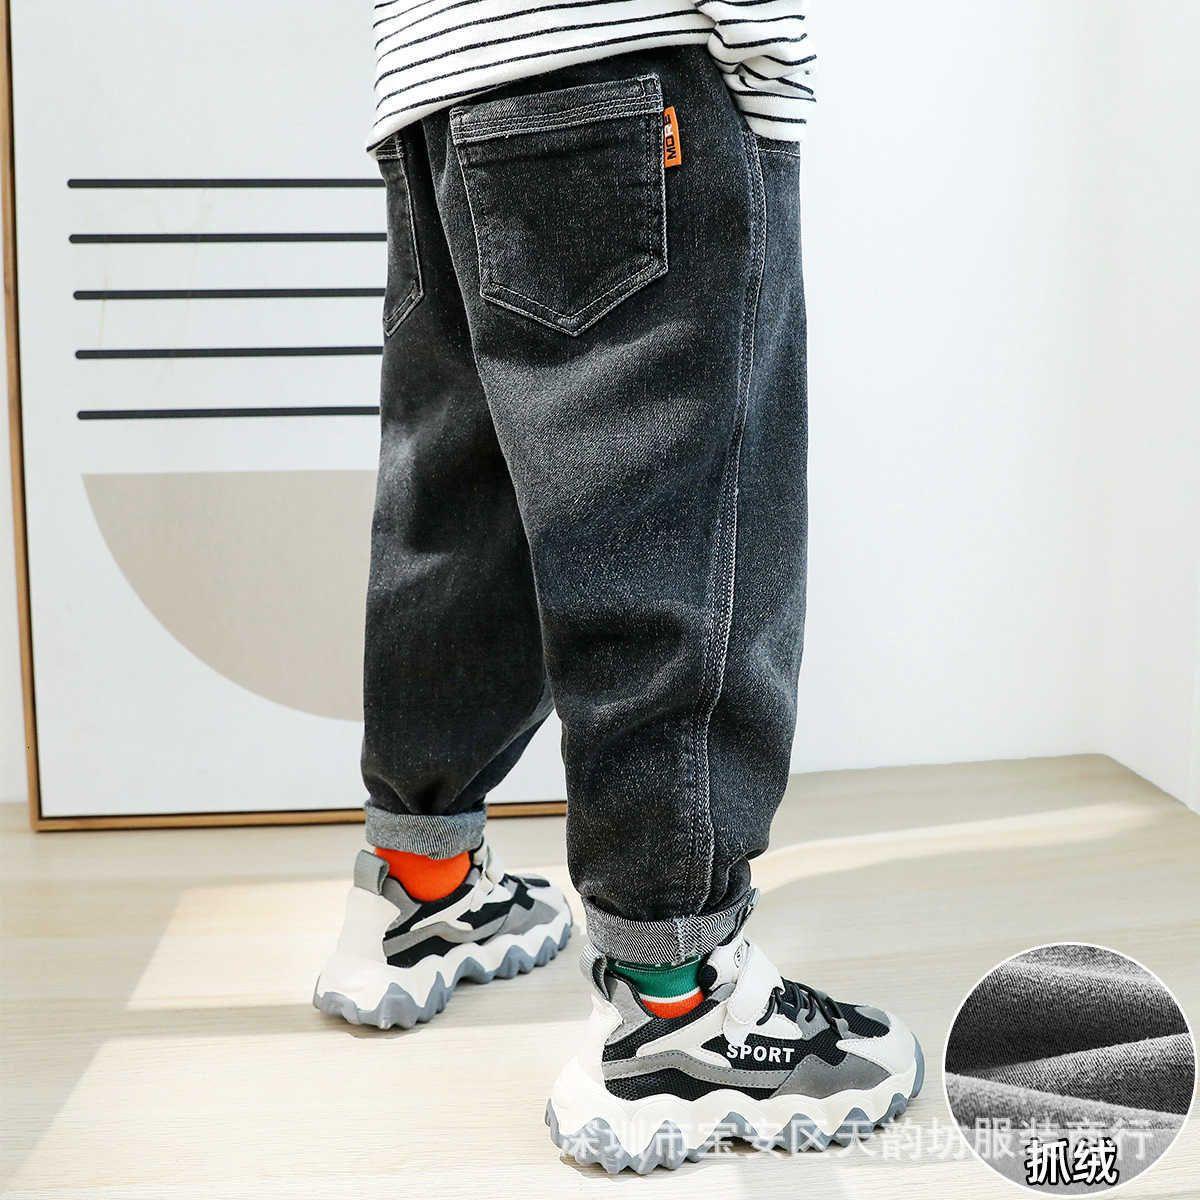 Guangzhou Niedriger Preis Nachtmarkt Jeans Kinderhose